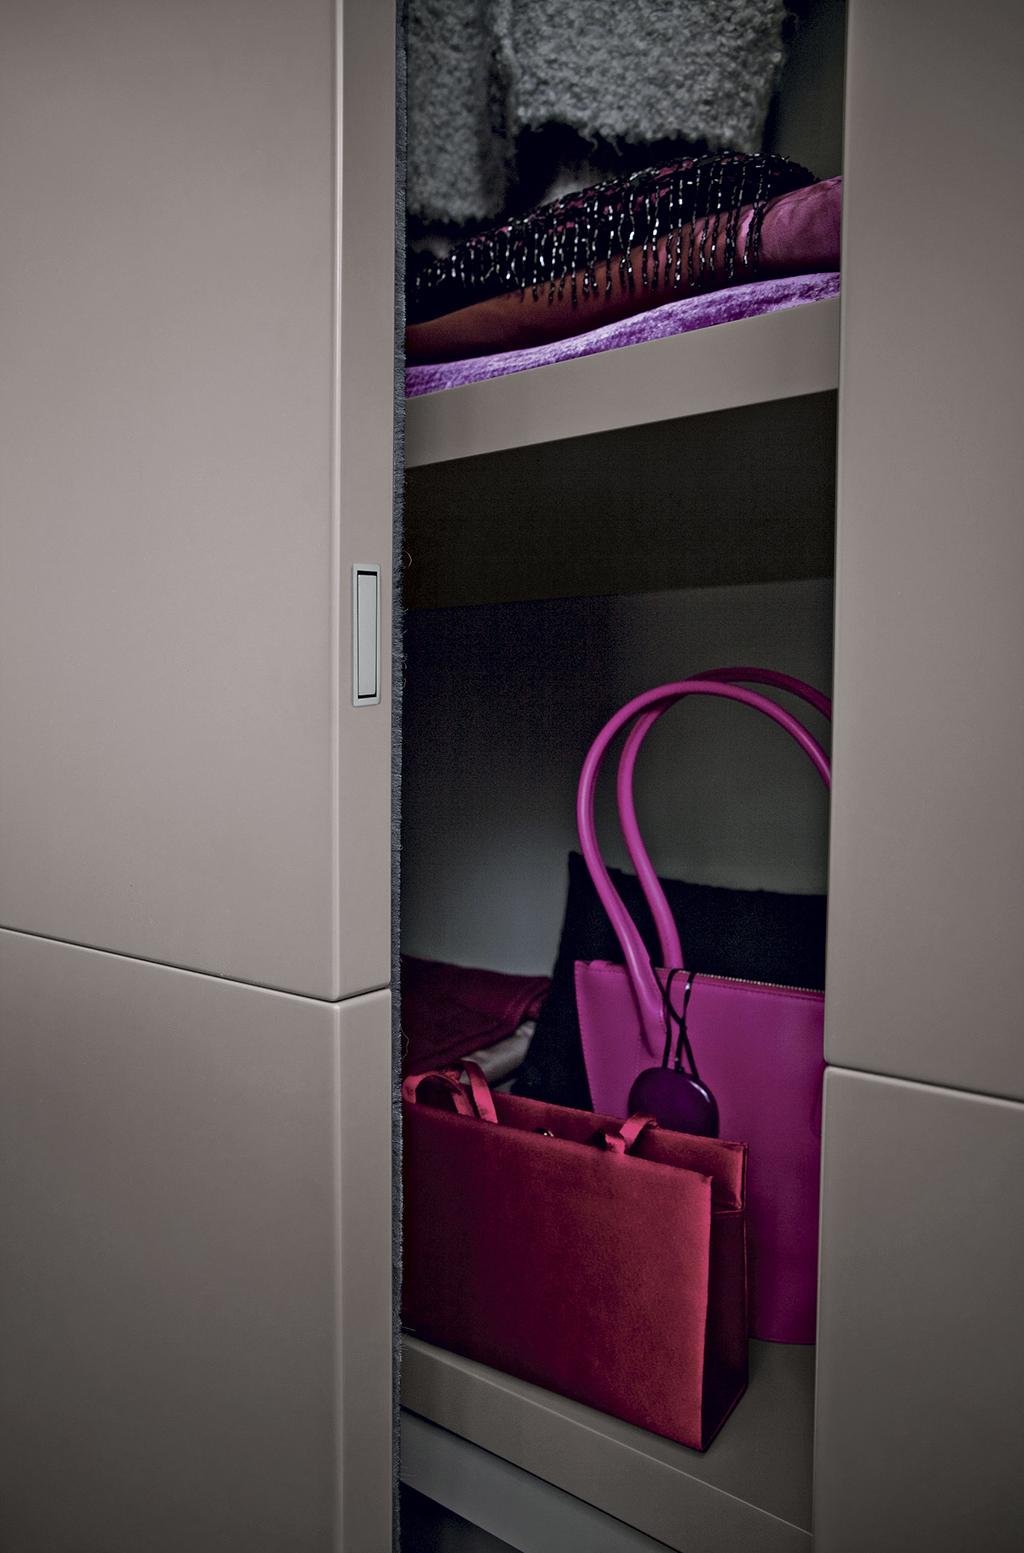 amore 064 fitted bedroom furniture wardrobes uk lawrence walsh furniture. Black Bedroom Furniture Sets. Home Design Ideas